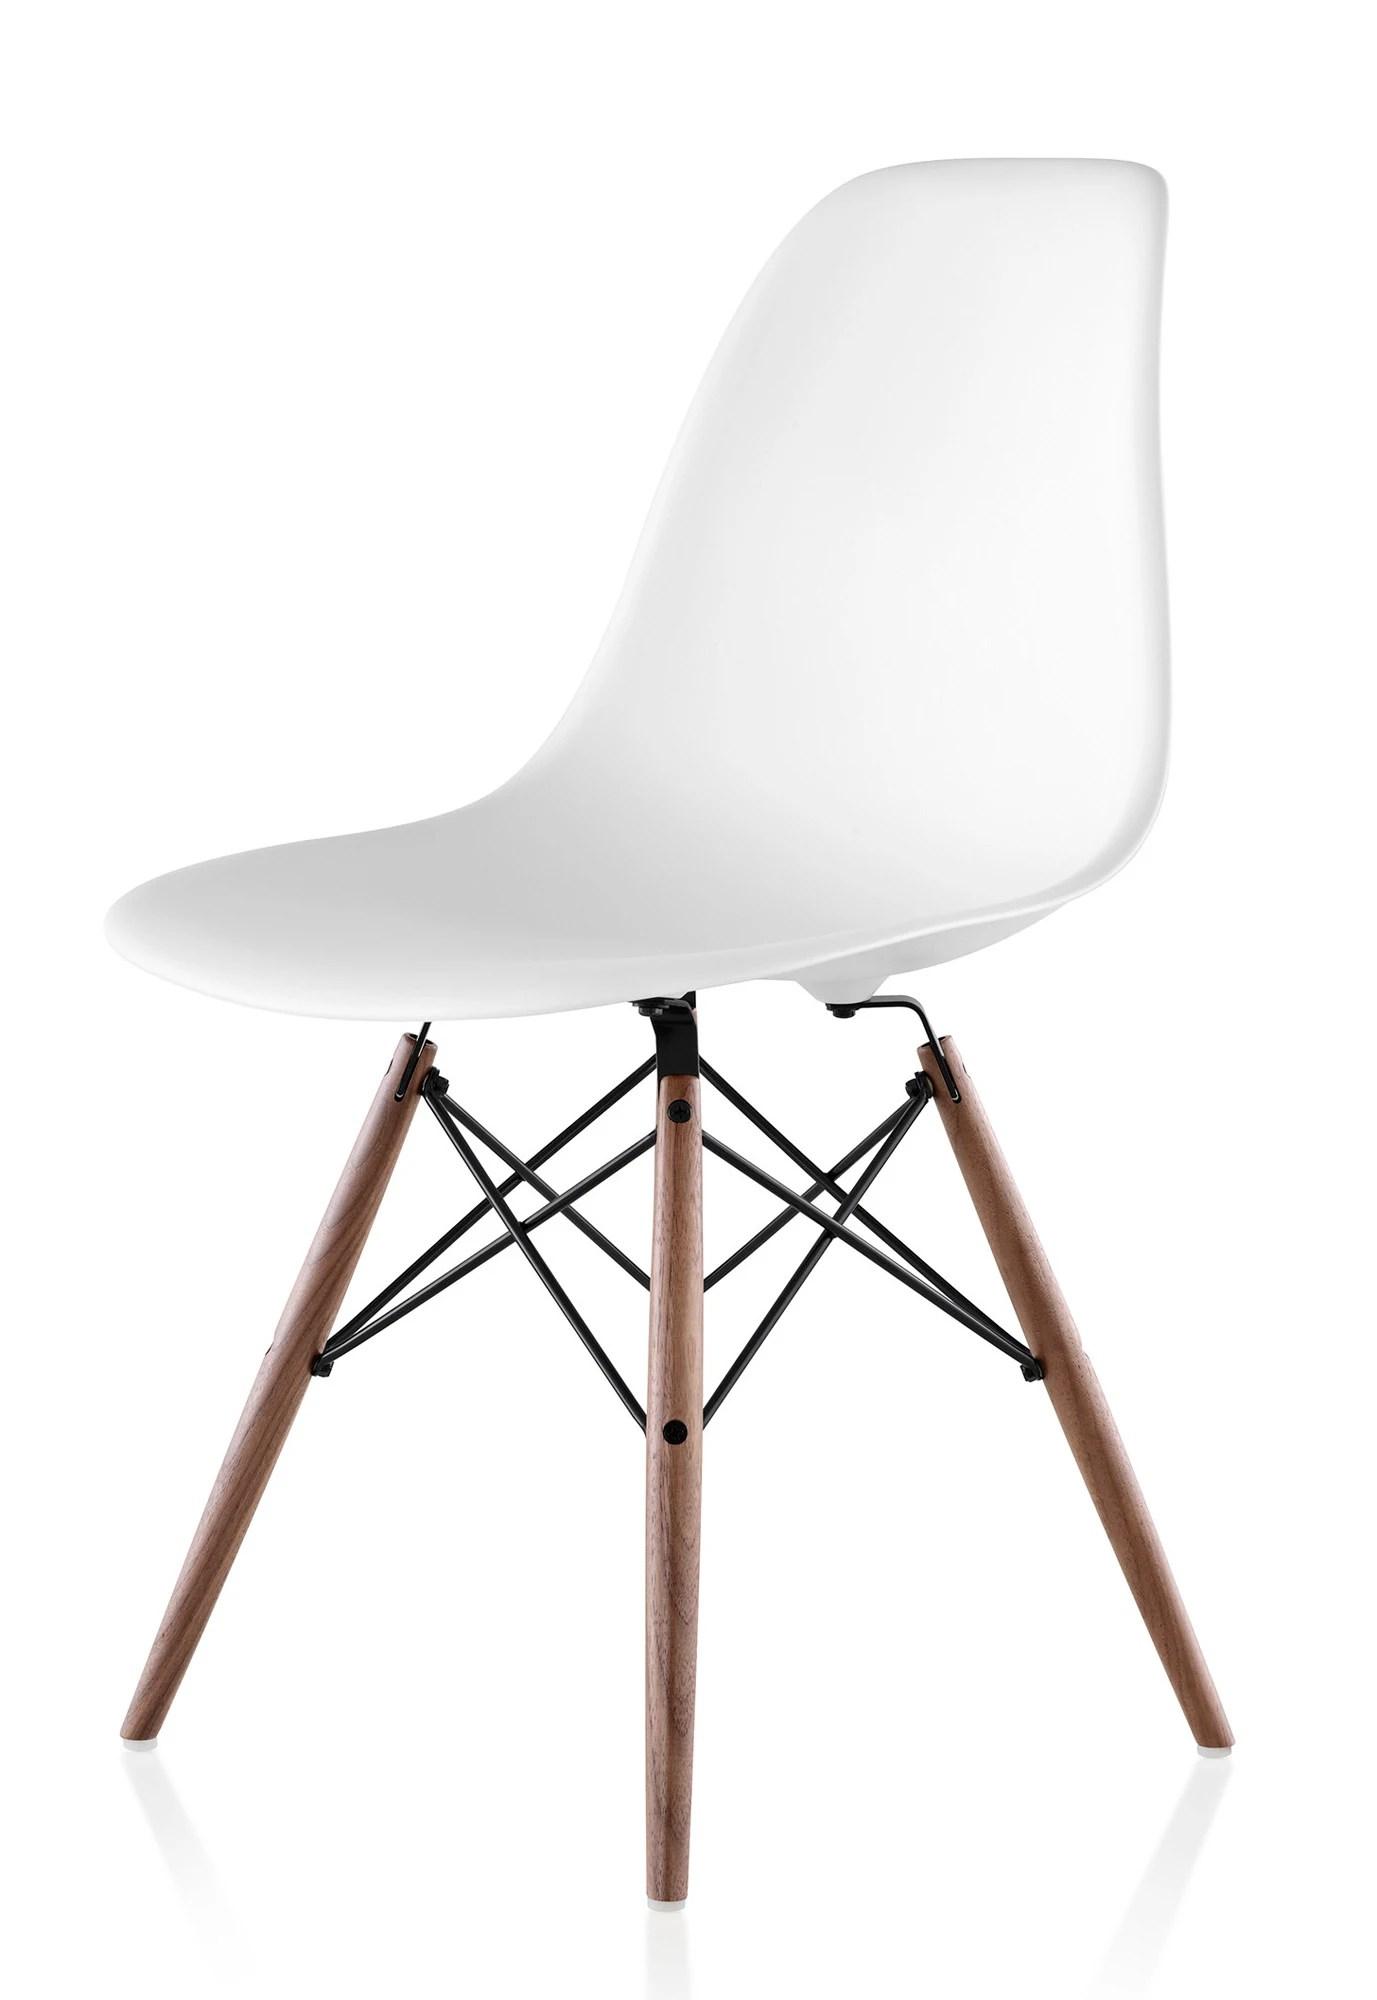 plastic molded chairs cobalt blue chair herman miller eames side gr shop